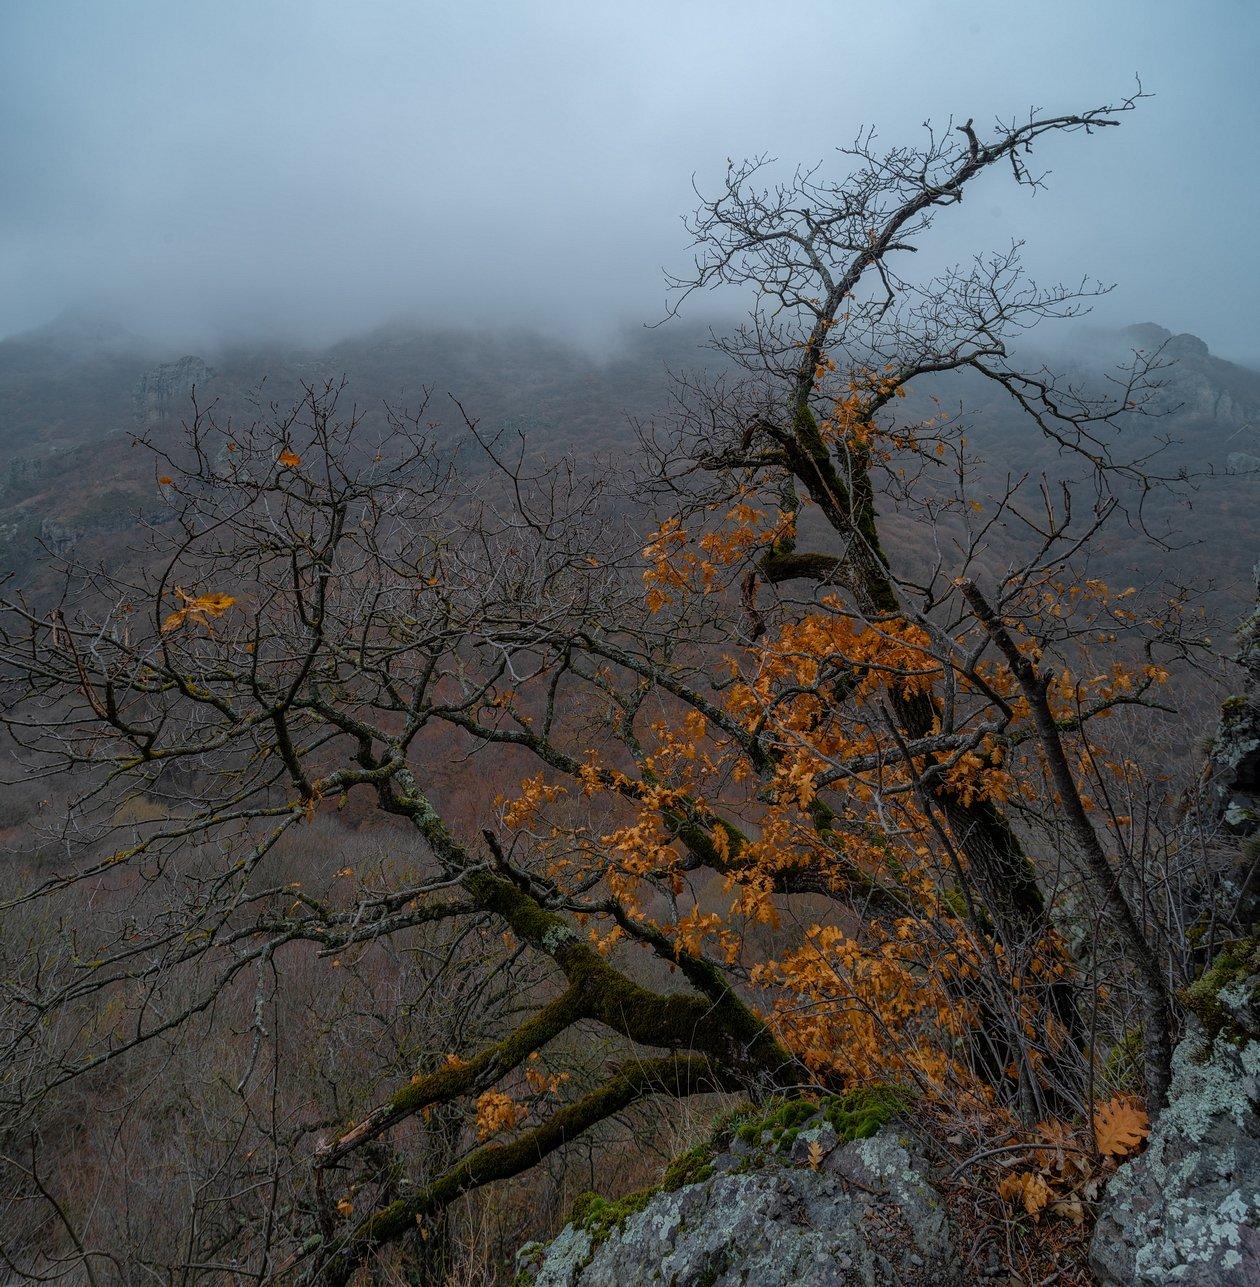 гора, рассвет, небо, плато, облака, утро, тучи, непогода, домбай ,дерево, туман, дымка, Алабердов Арсен